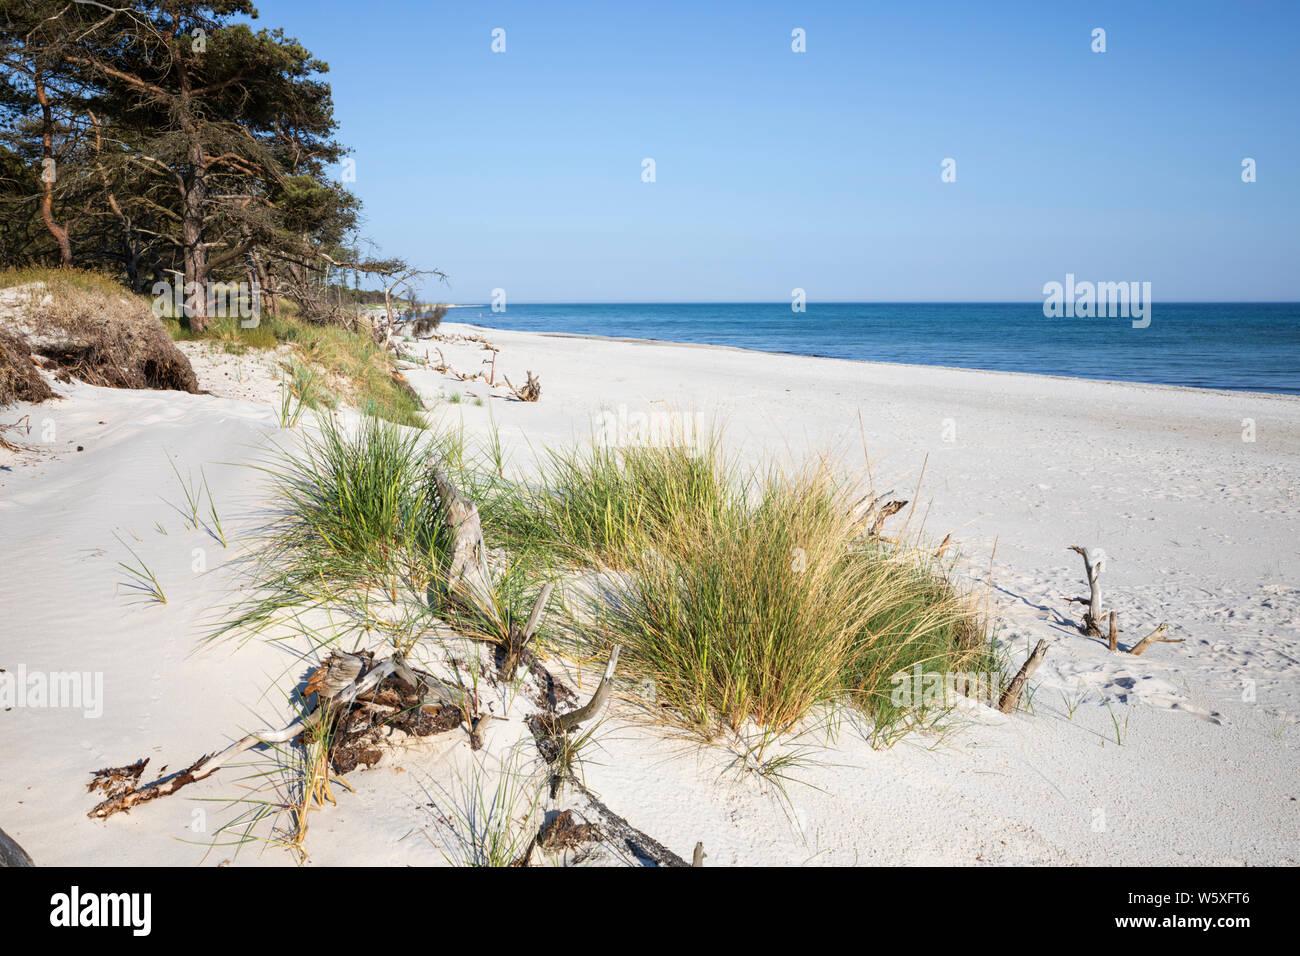 White sand beach of Dueodde on island's south coast, Dueodde, Bornholm Island, Baltic sea, Denmark, Europe Stock Photo